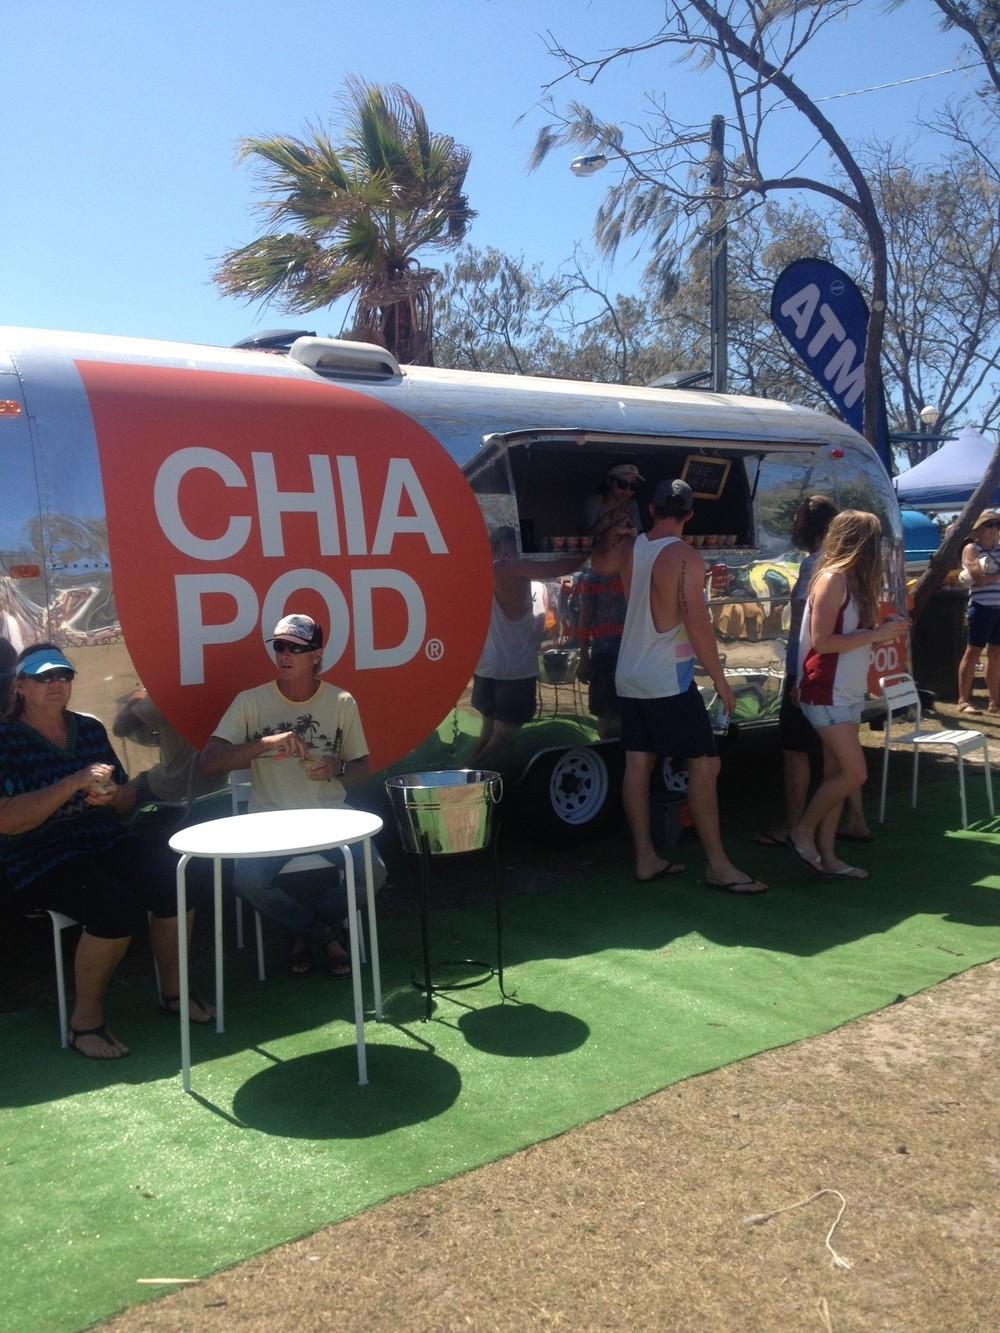 Chia Pods